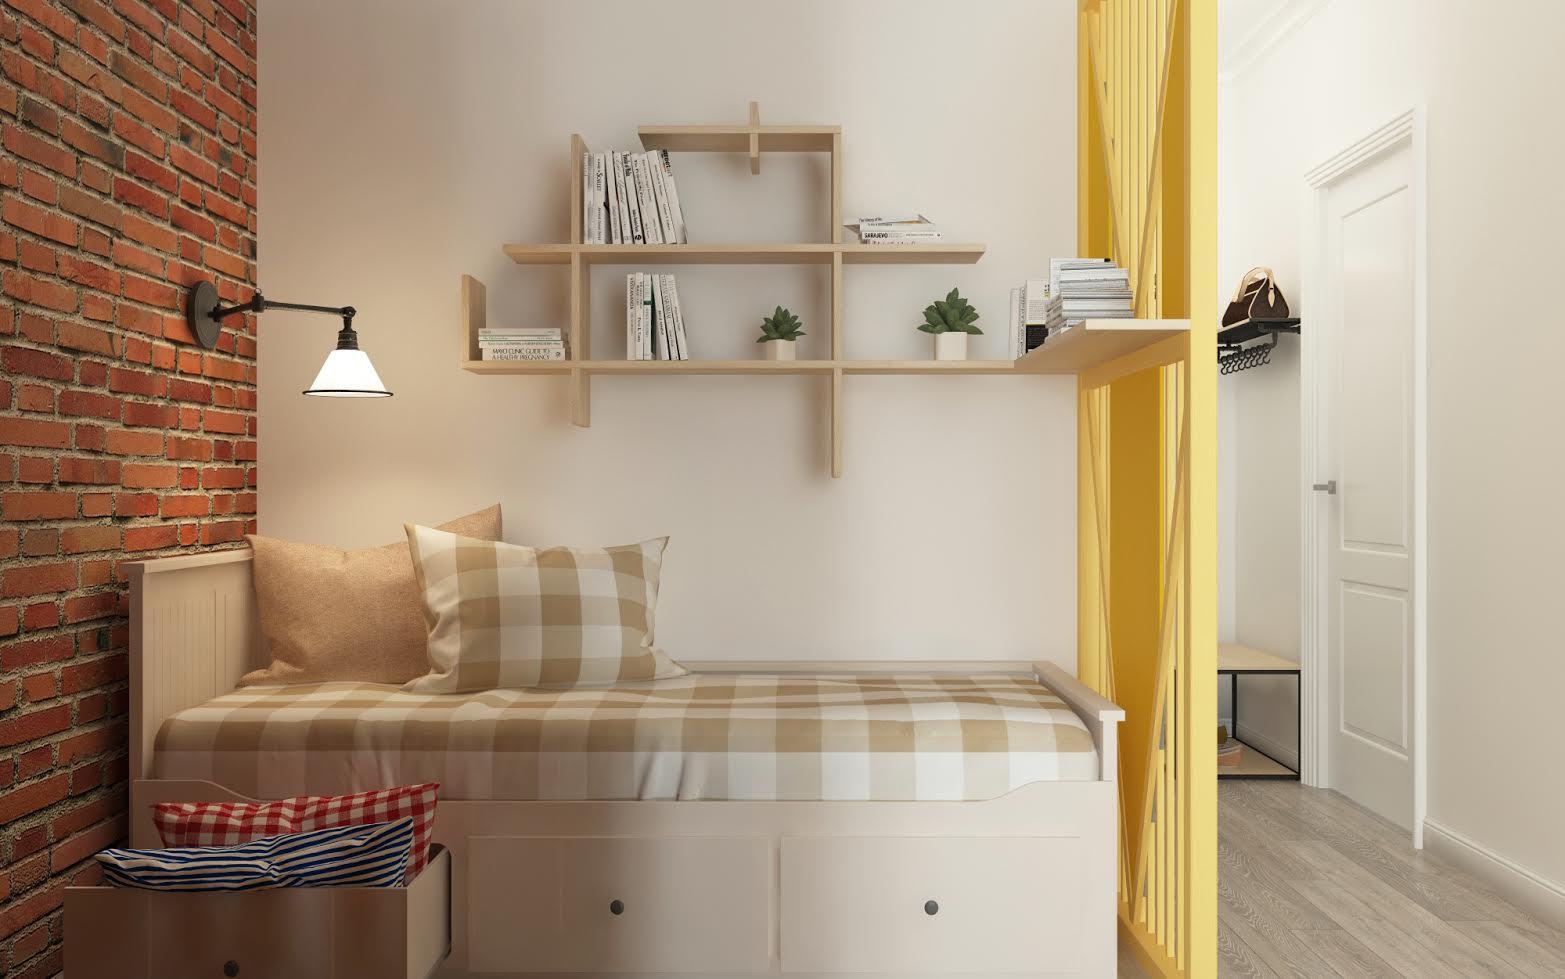 Проект квартиры-студии 58 м2 в стиле лофт.